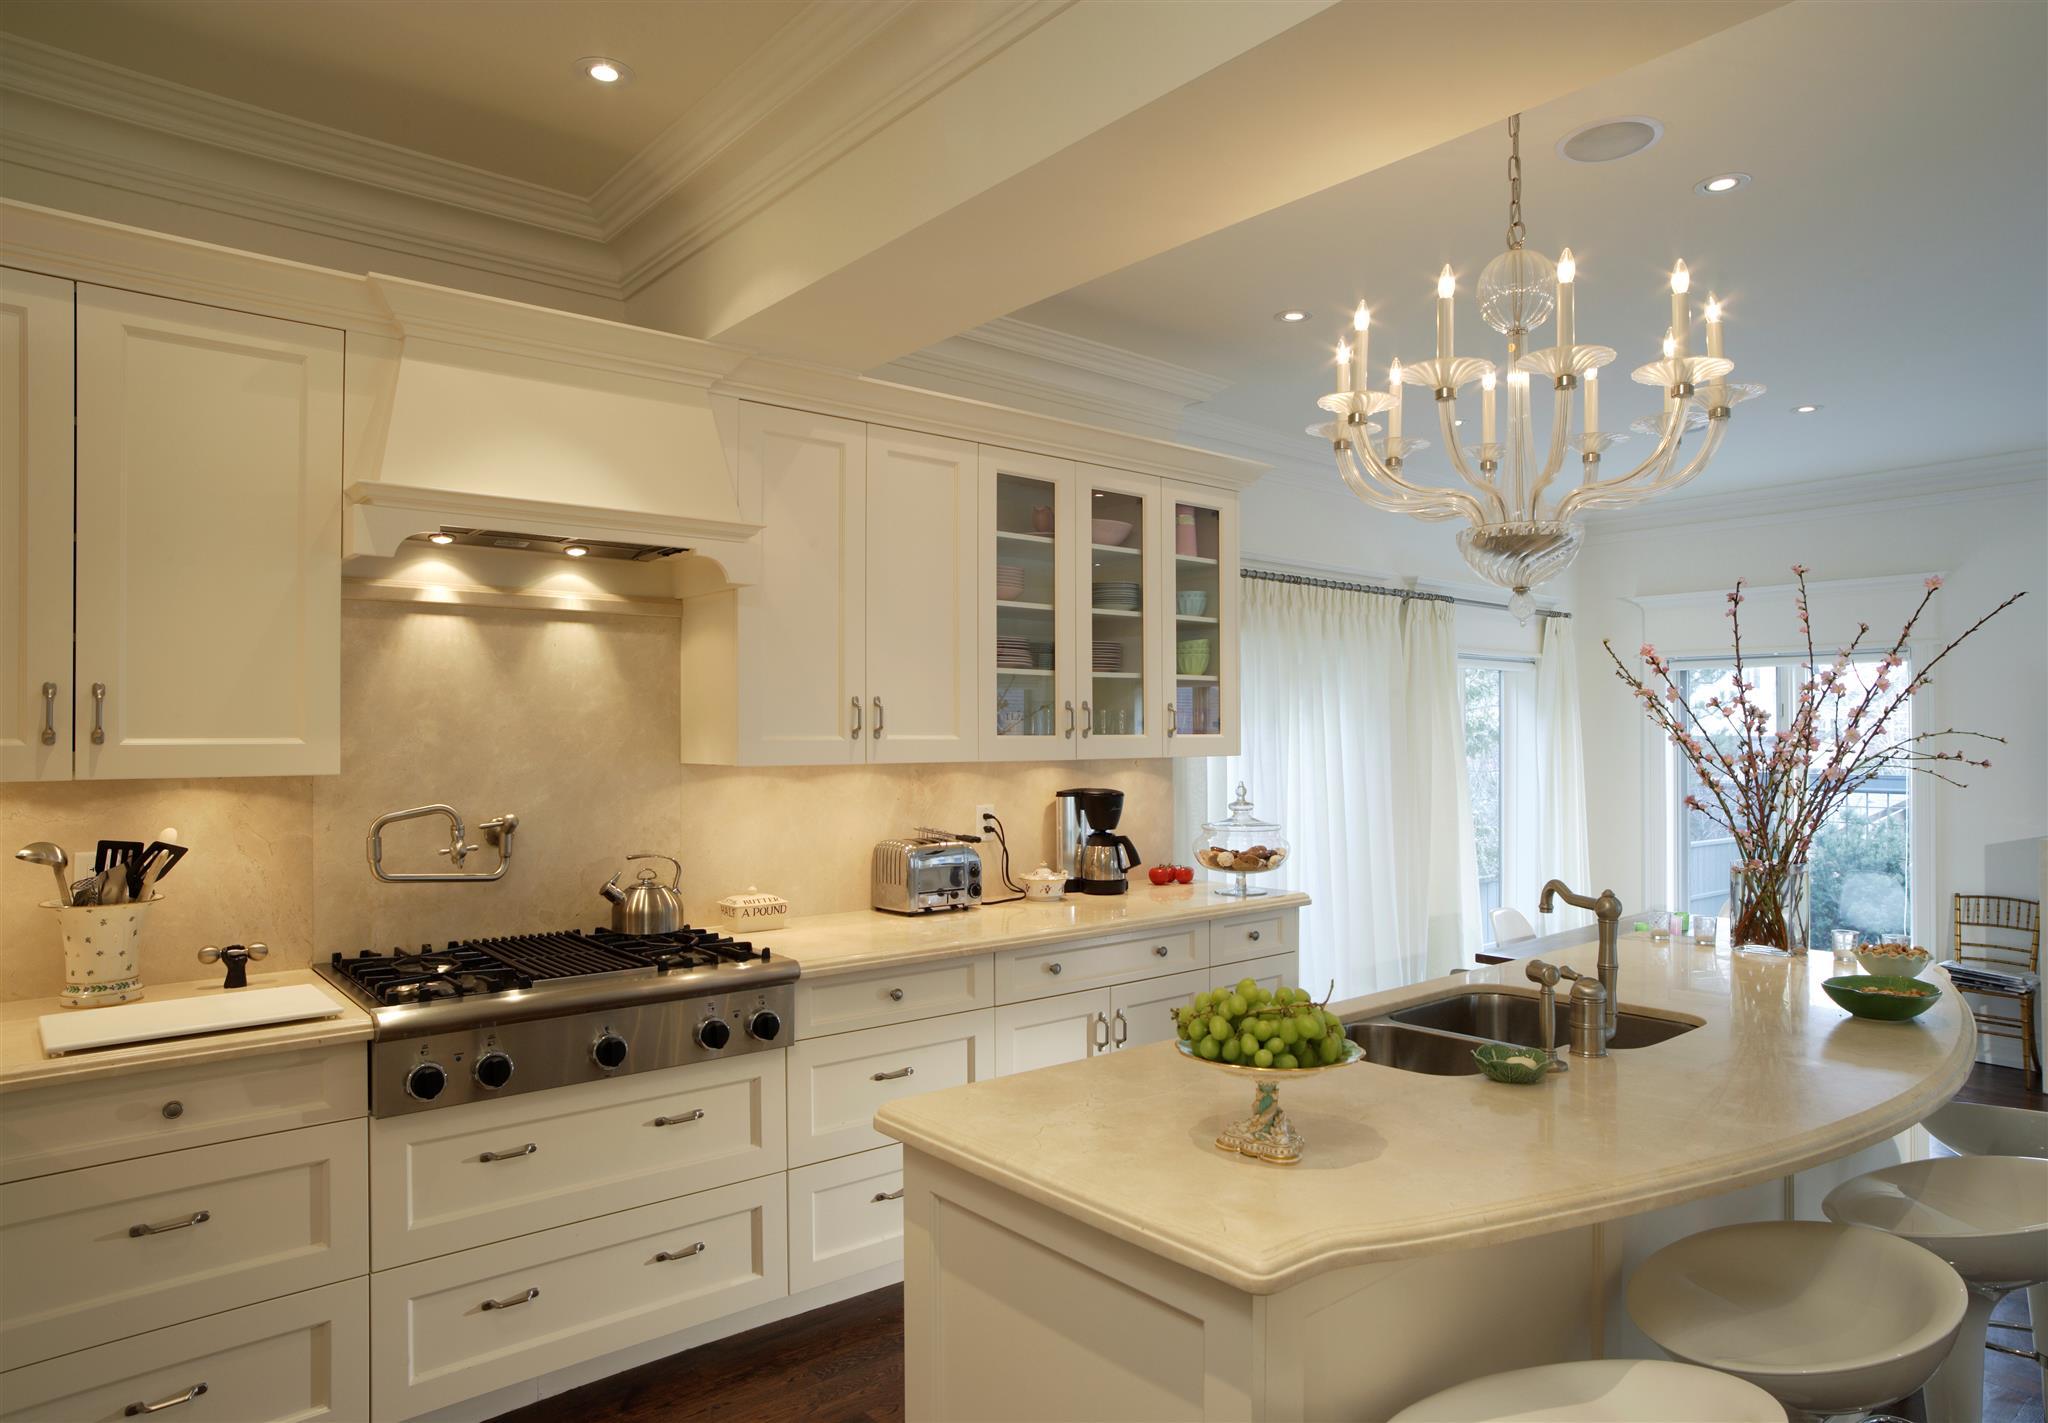 Кухонные люстры фото